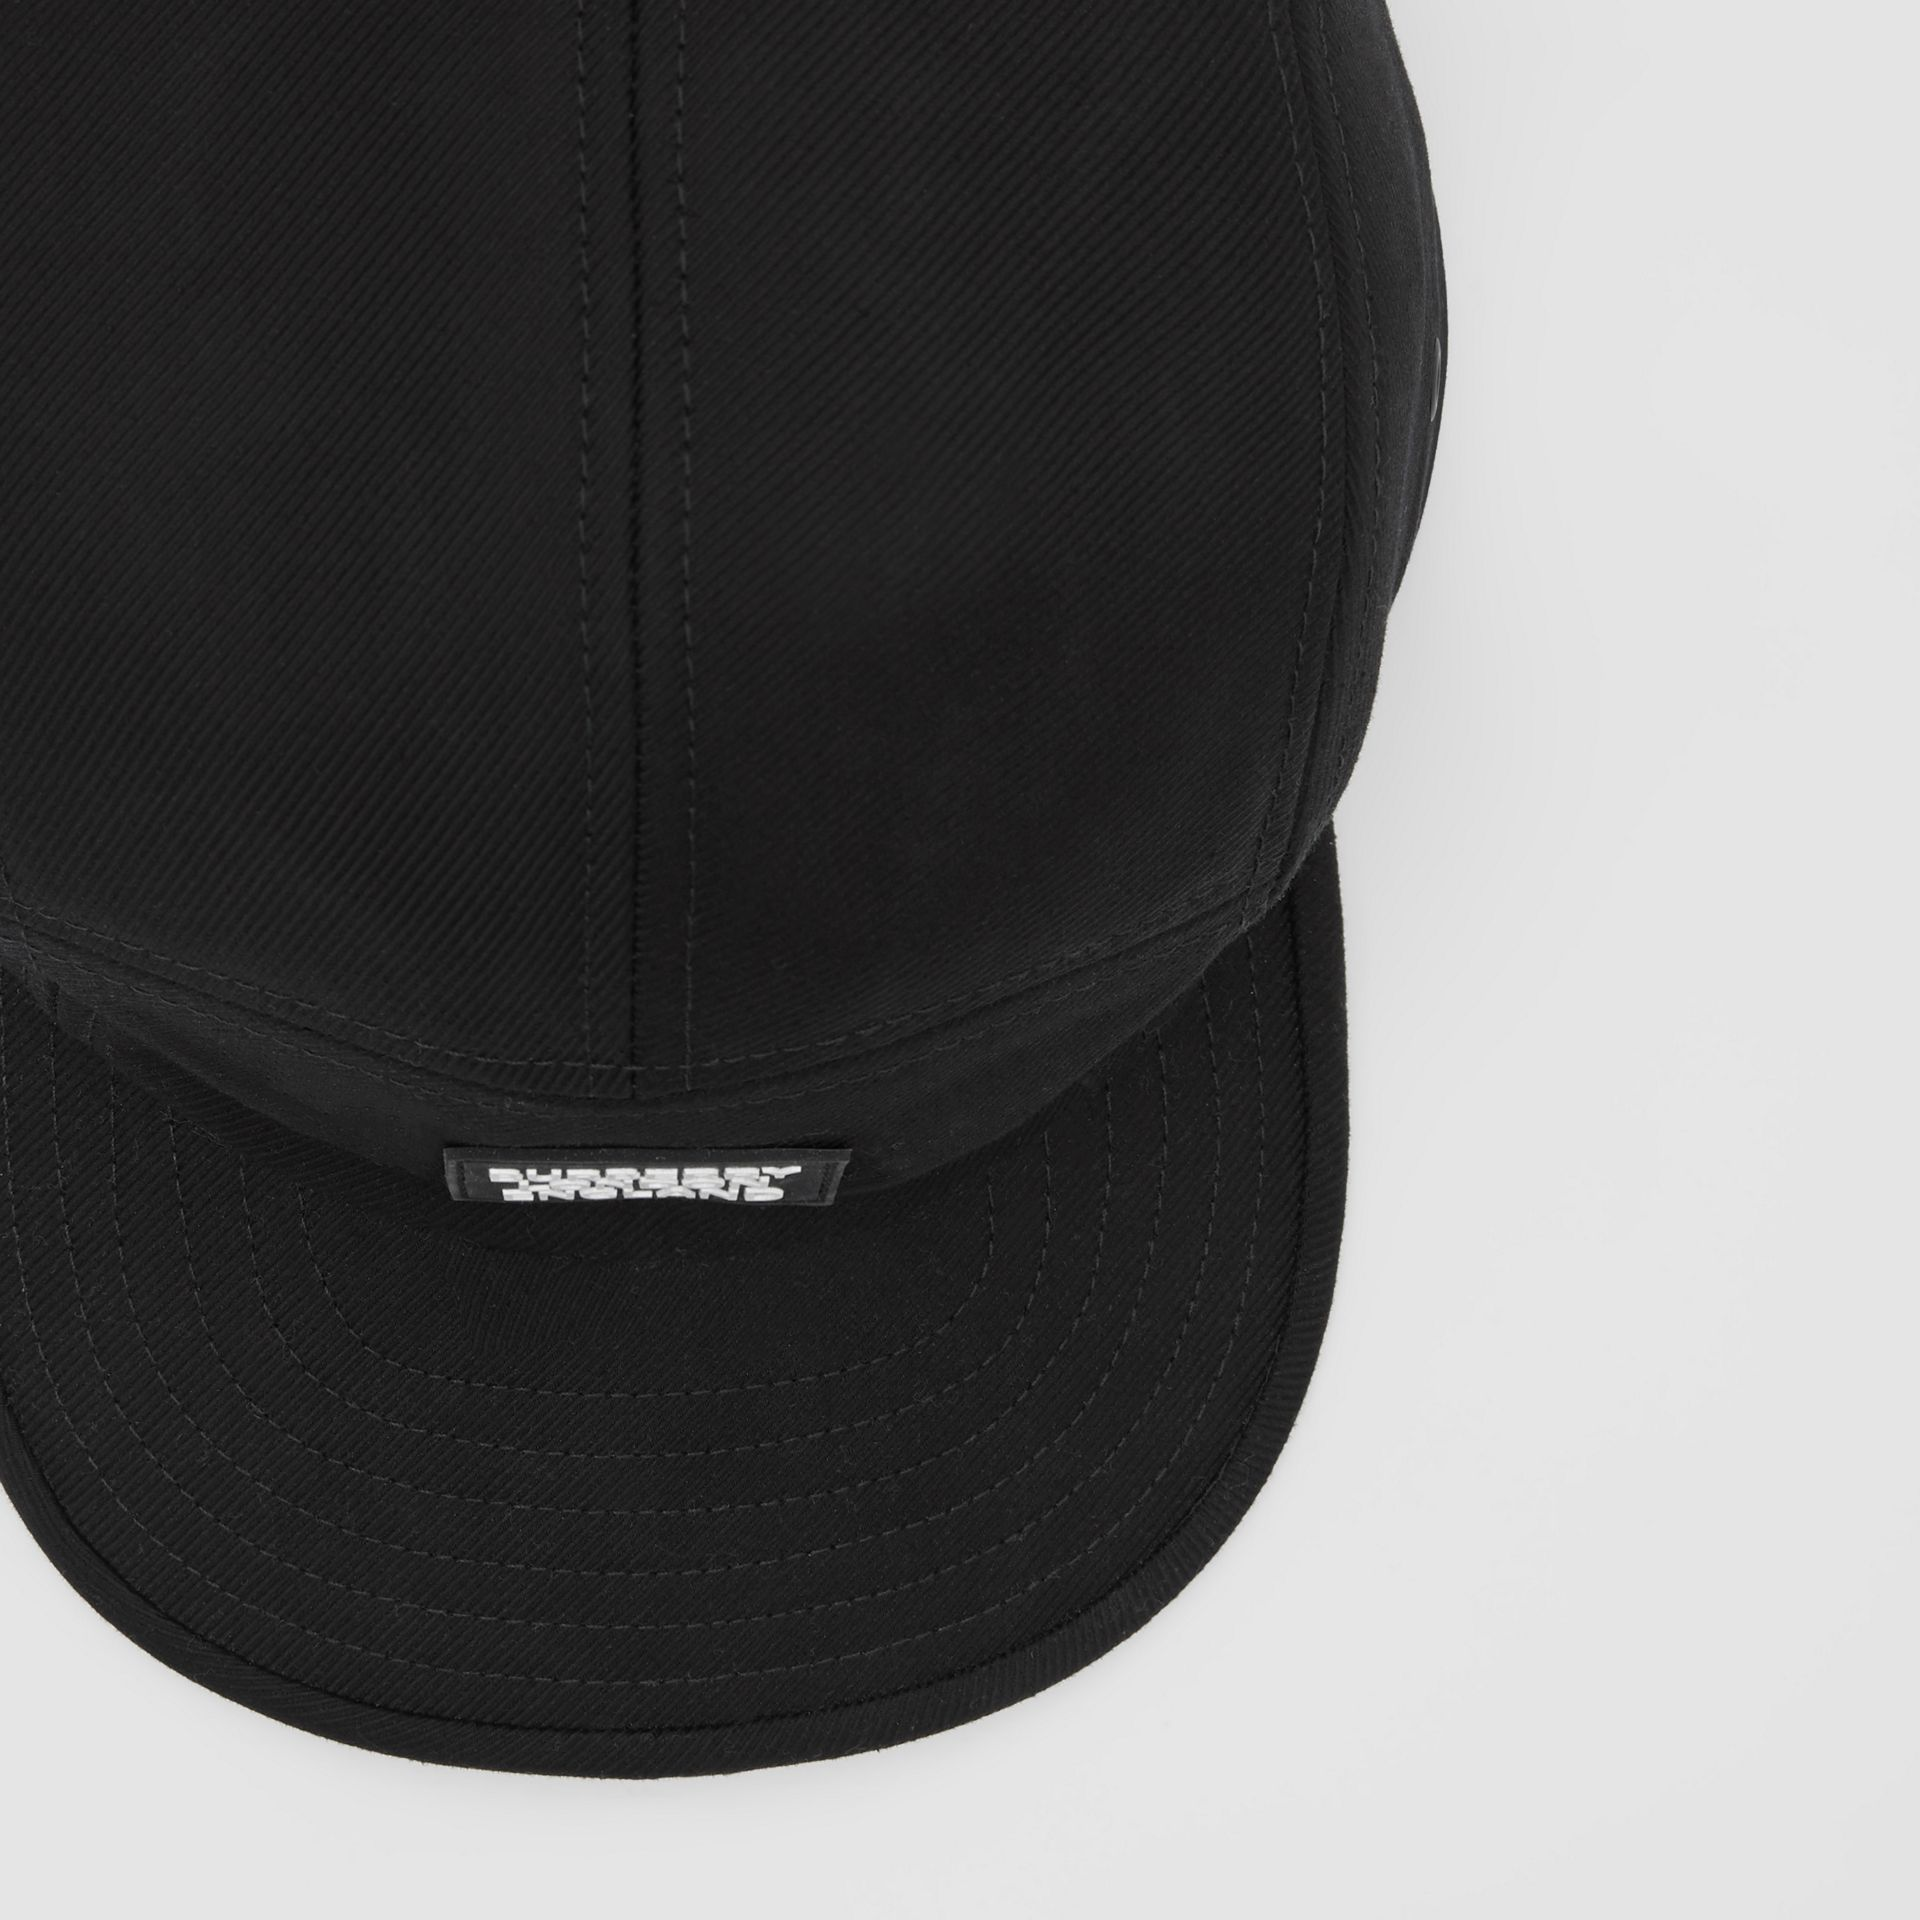 Logo Appliqué Cotton Twill Cap in Black | Burberry Singapore - gallery image 1